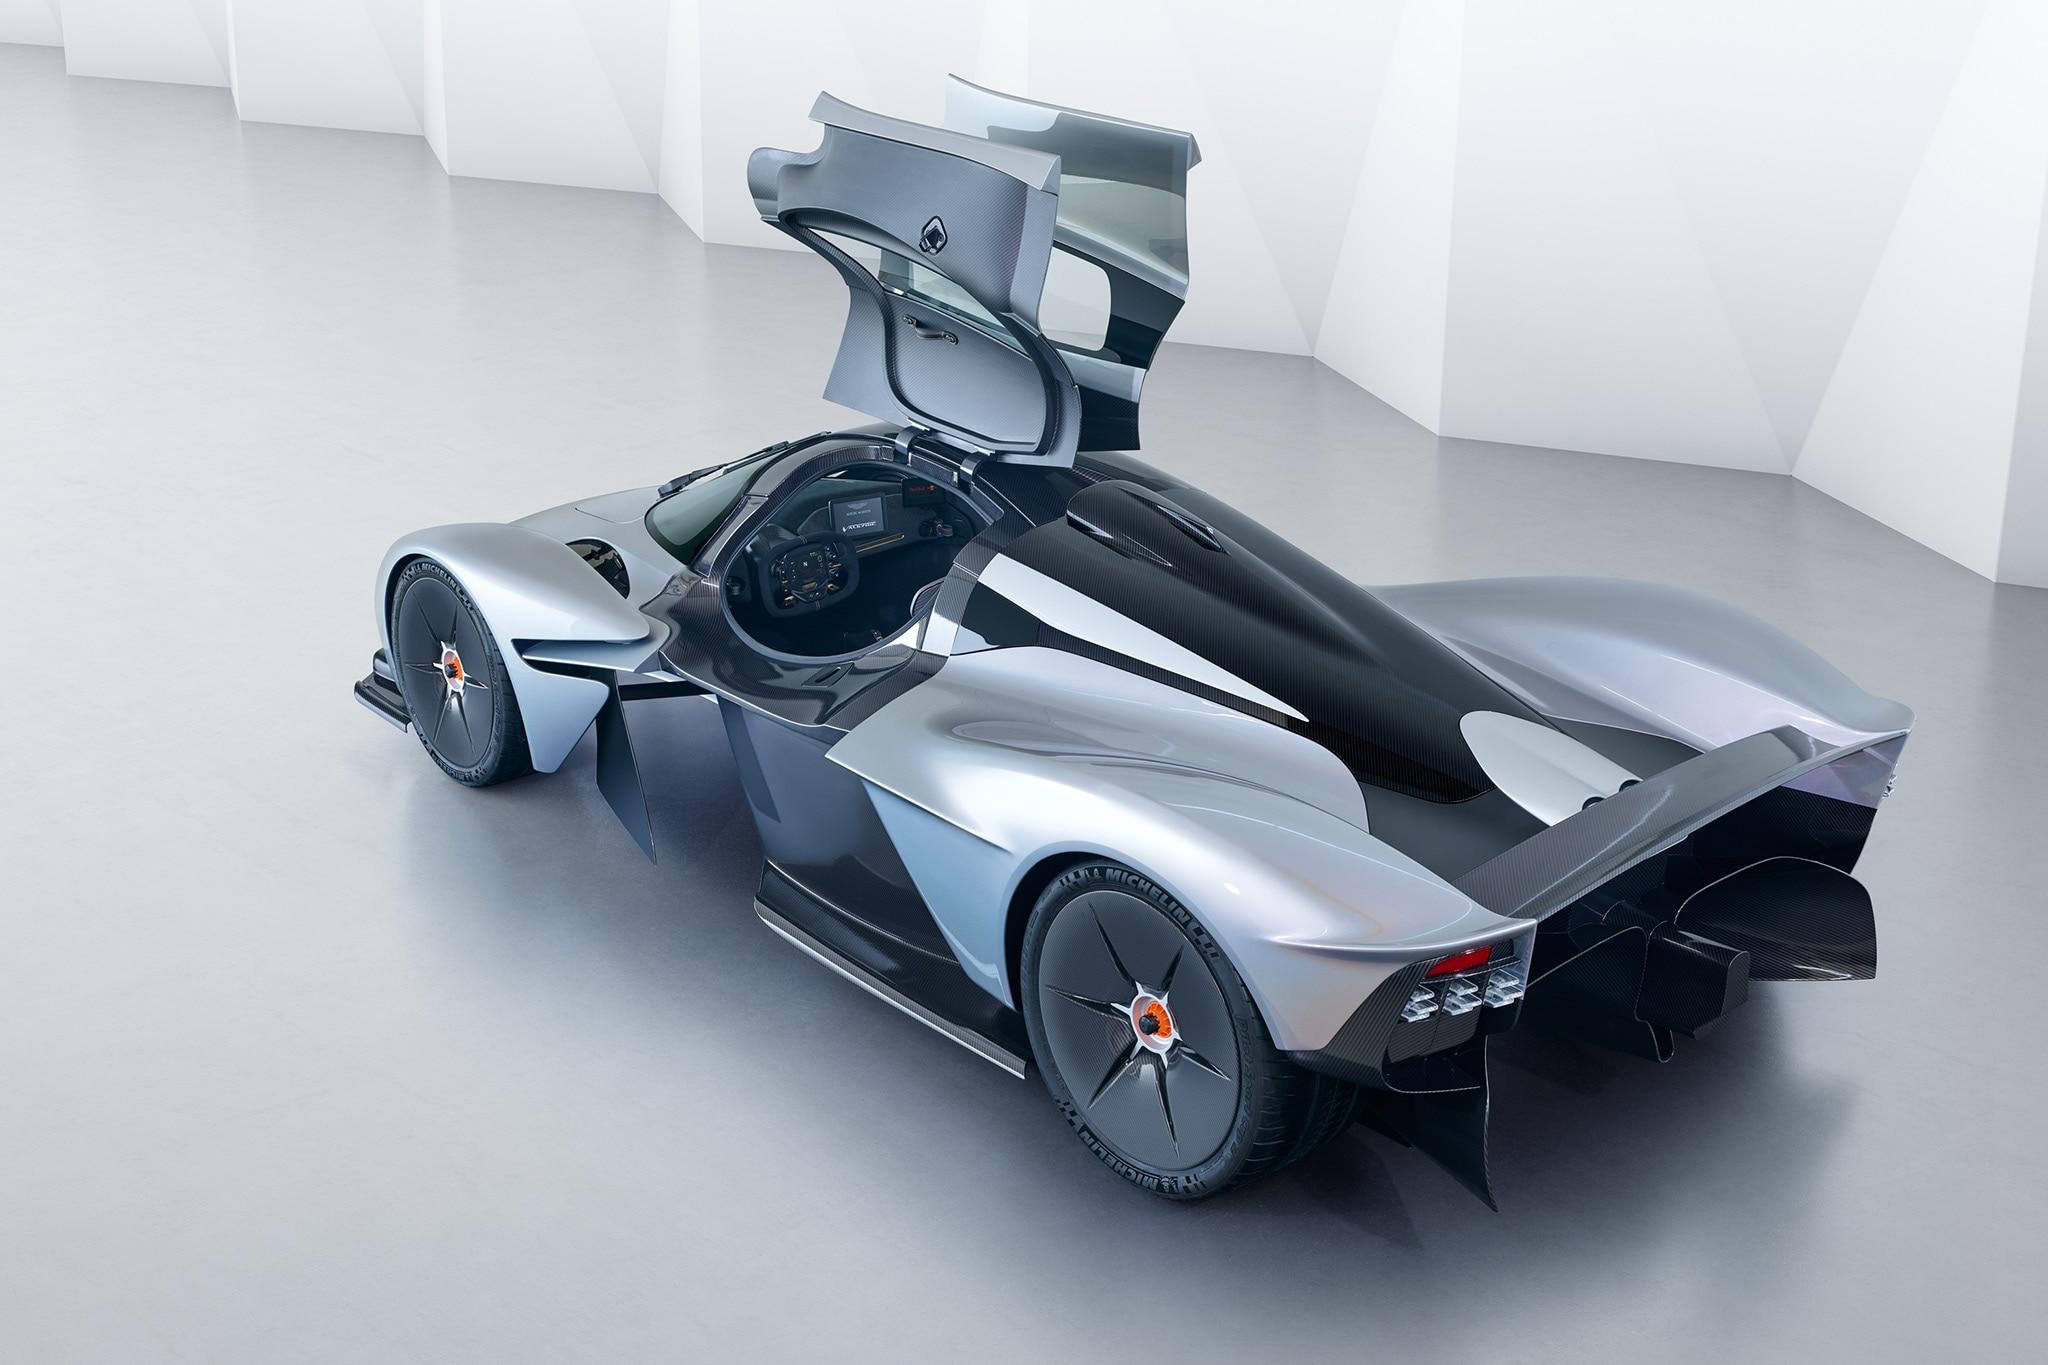 Aston Martin Valkyrie July 2017 03